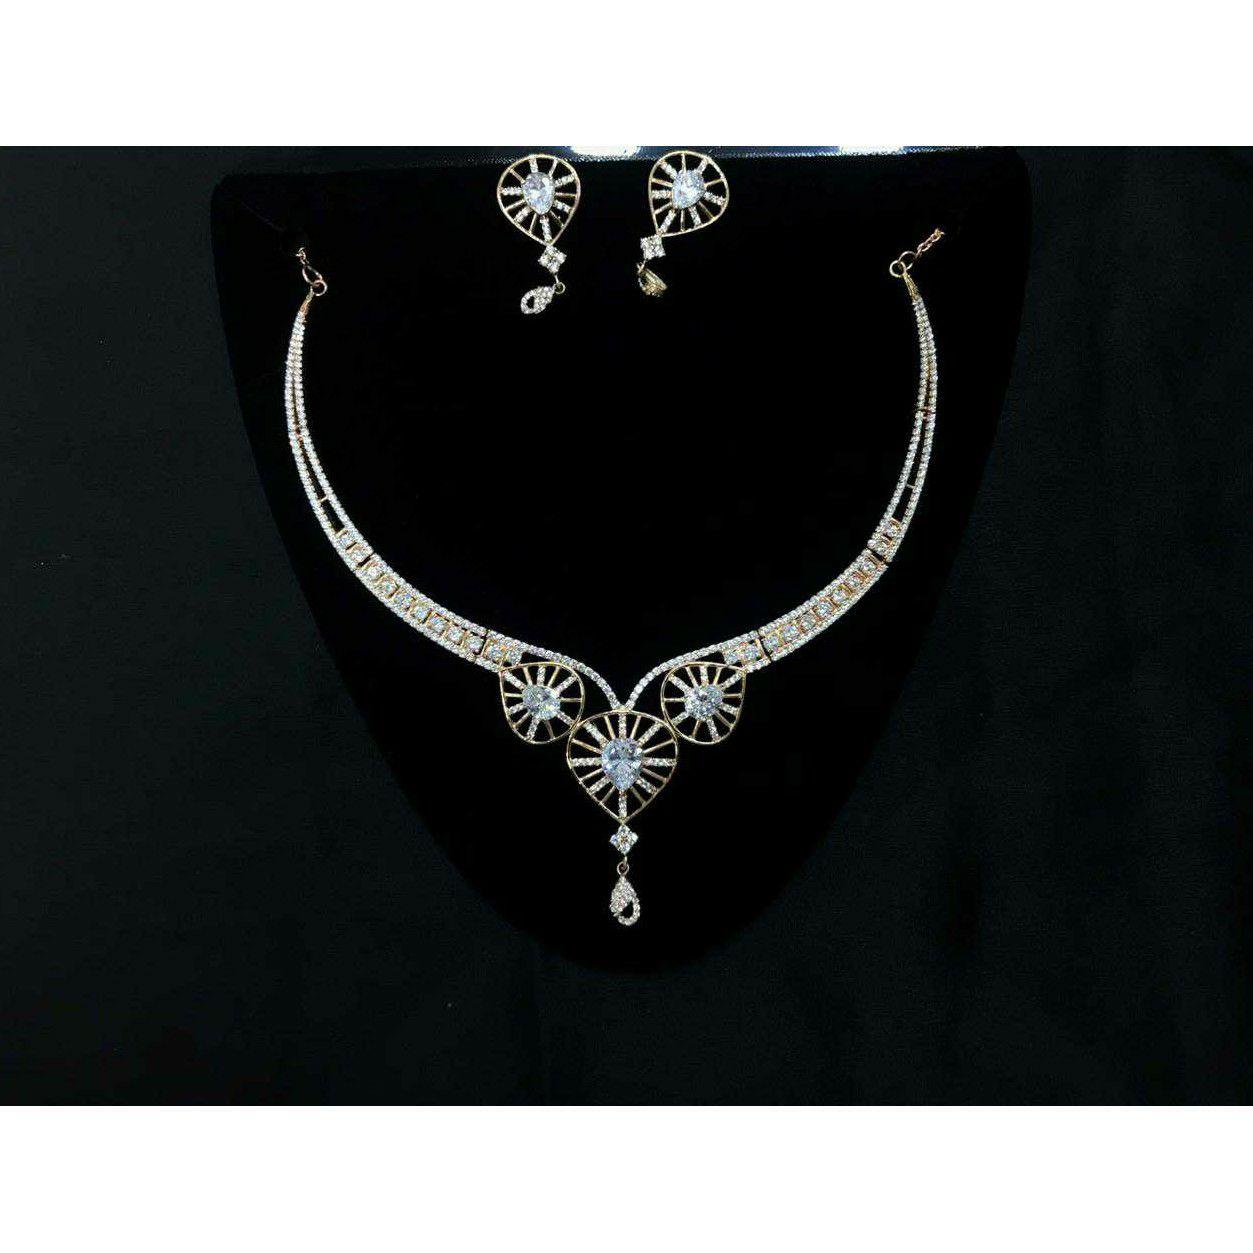 92.5 Sterling Silver Heart Shape Necklace Set Ms-3935